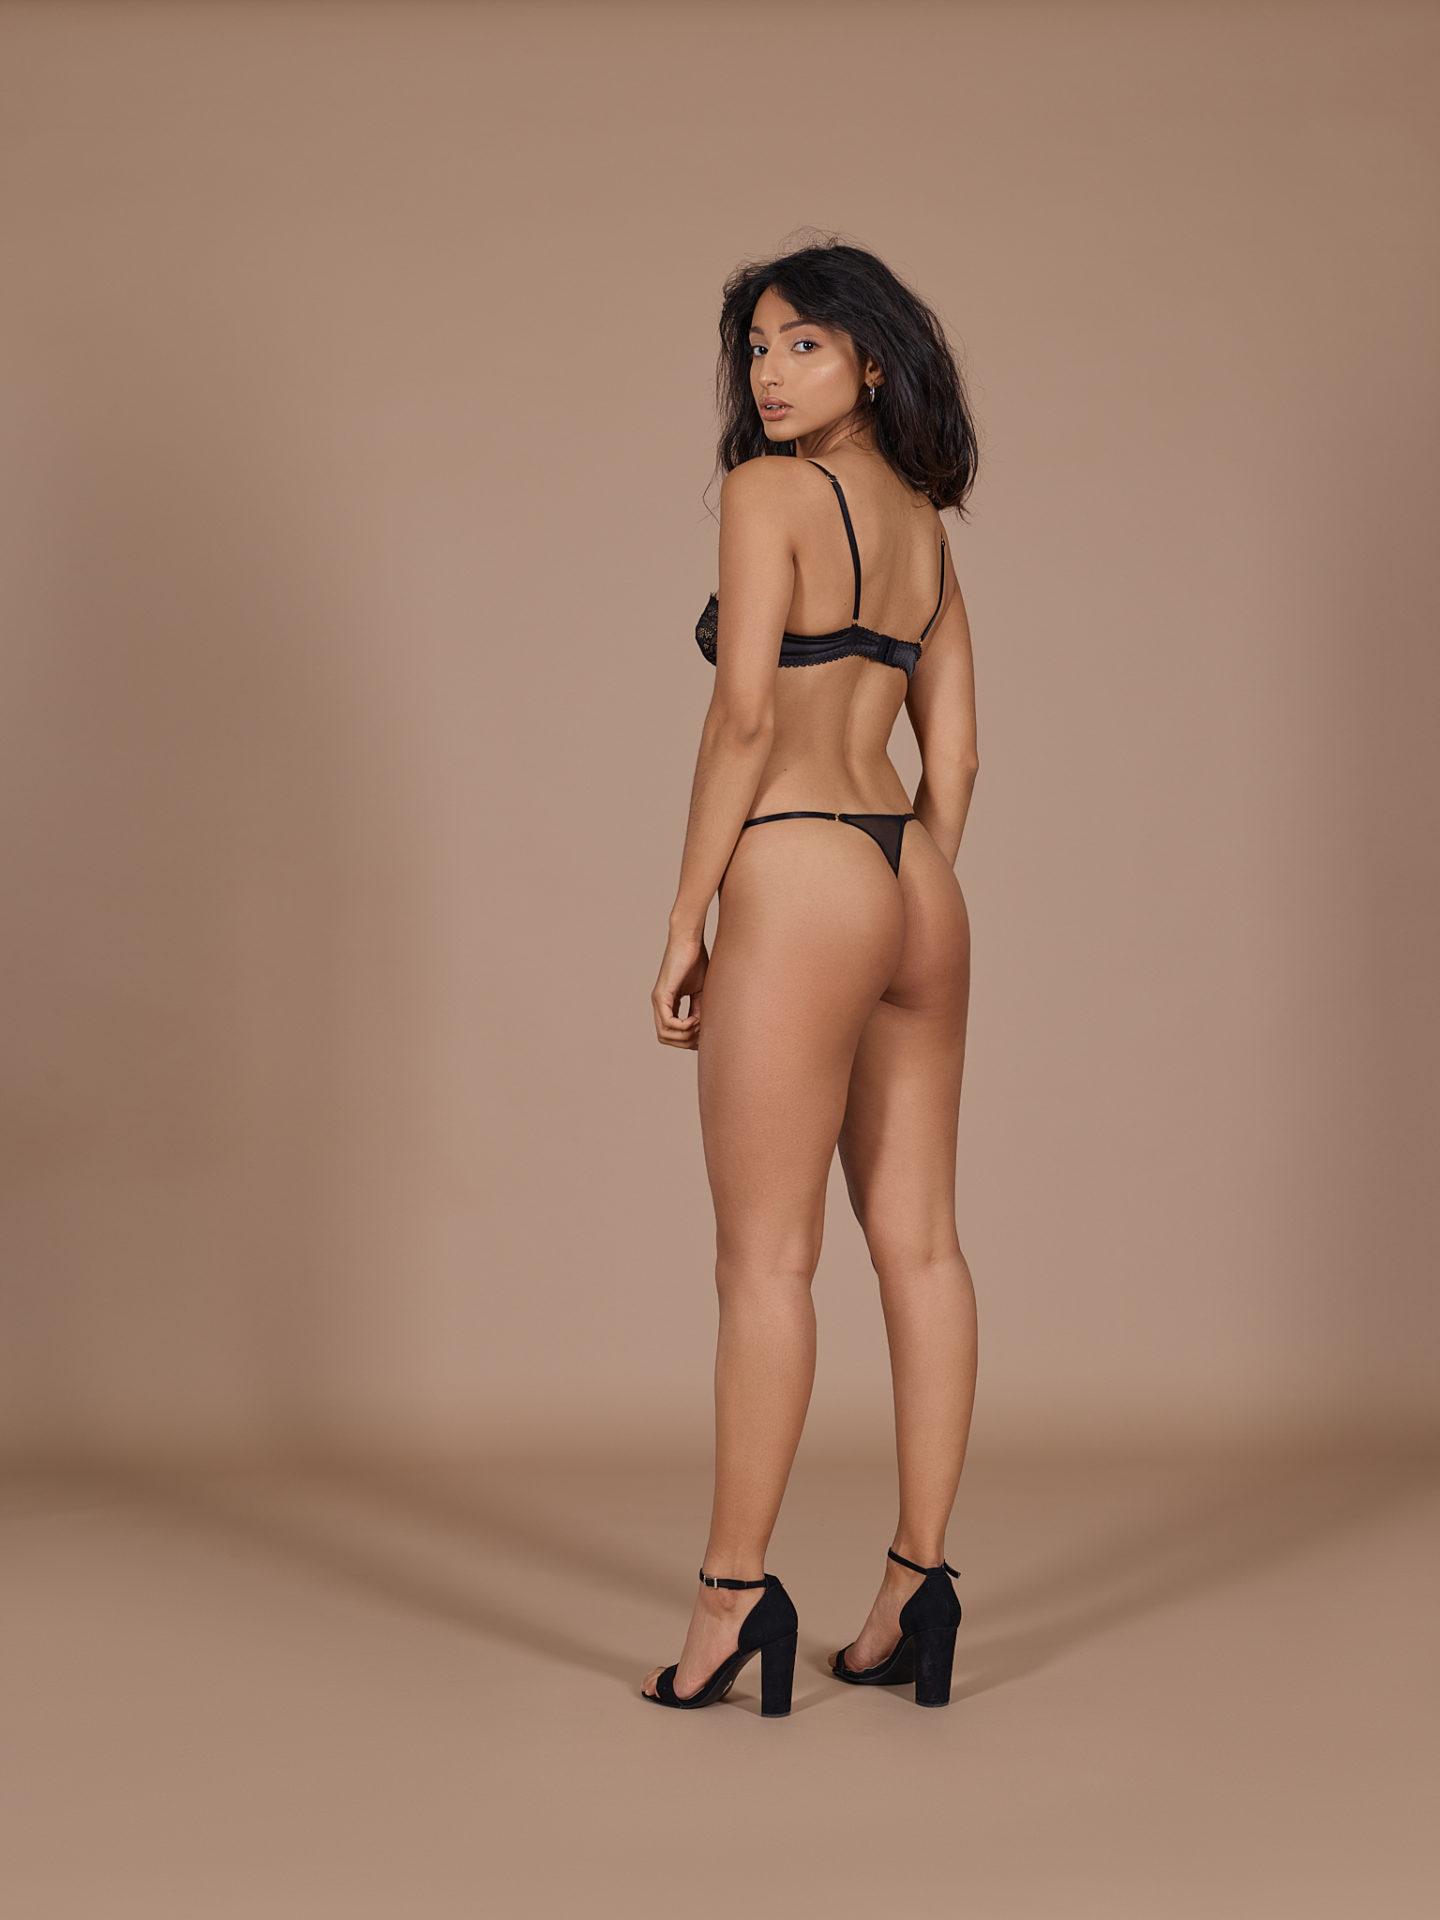 Photographe e-commerce lingerie portée